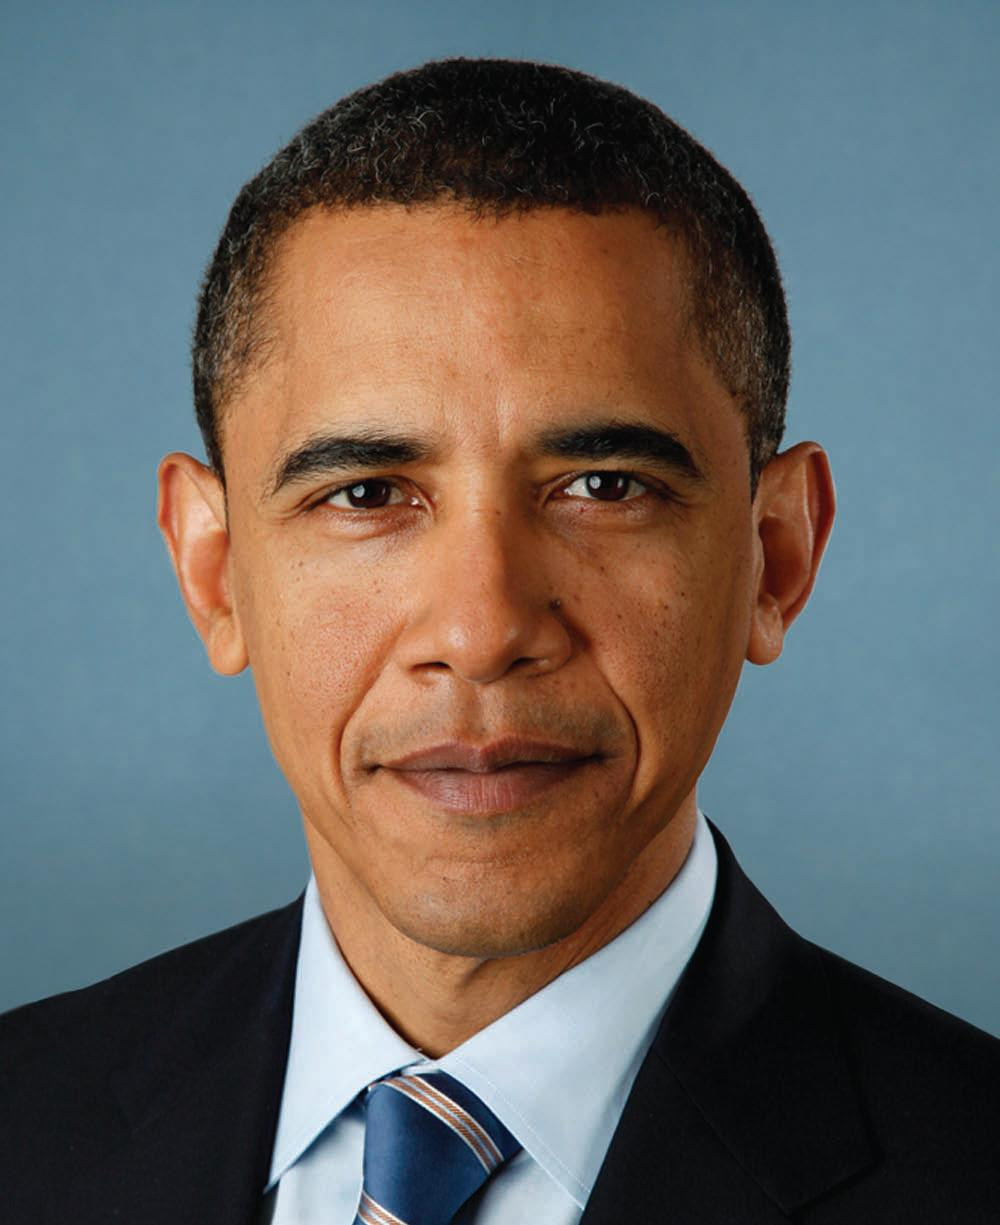 Best Beautiful Wallpaper Barack Obama Barack Obama